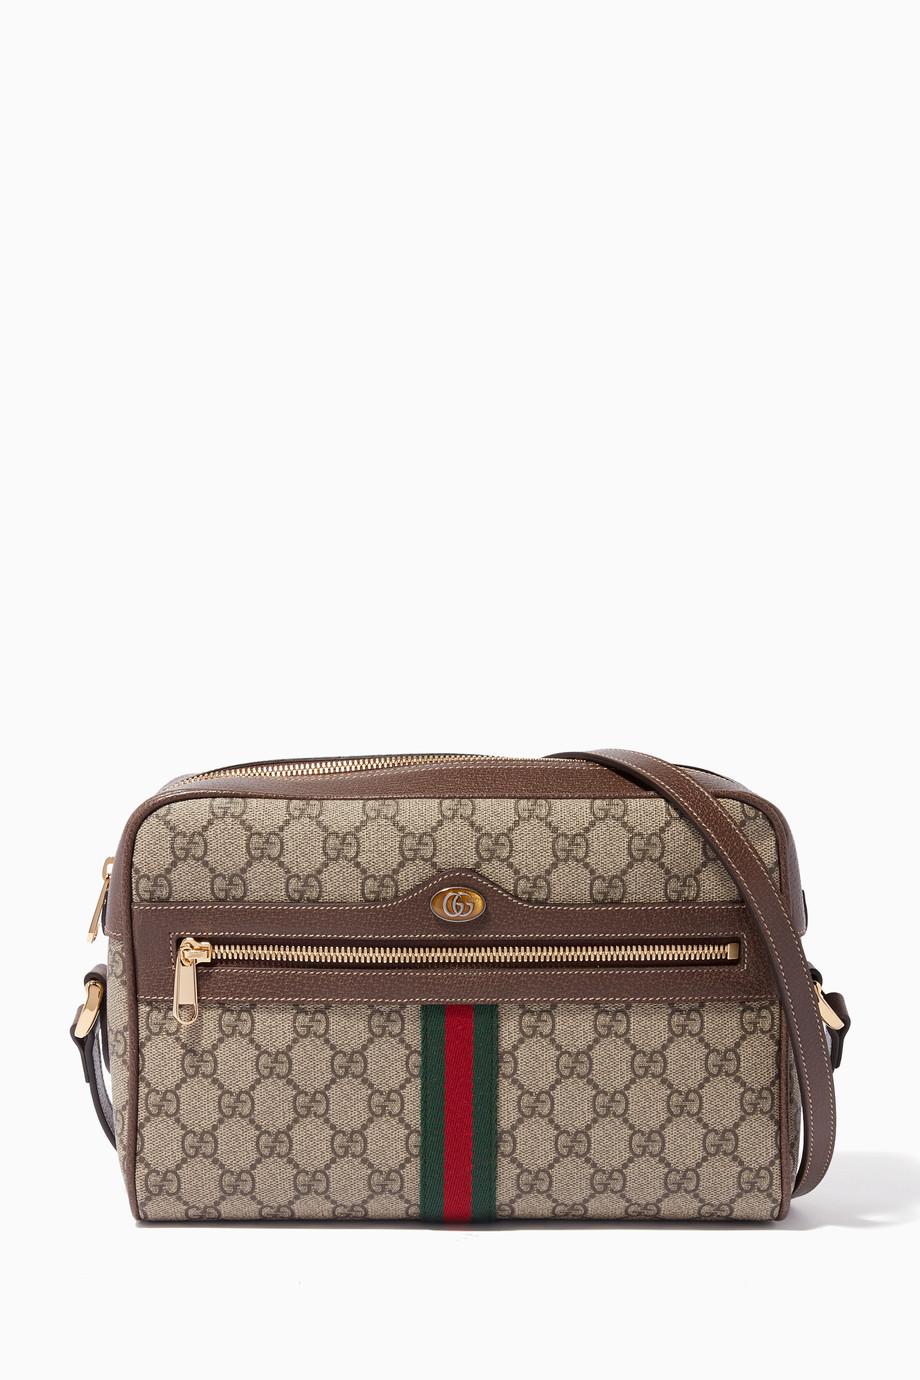 9b049cda2f1b Shop Gucci Neutral Beige Ophidia GG Supreme Medium Shoulder Bag for ...